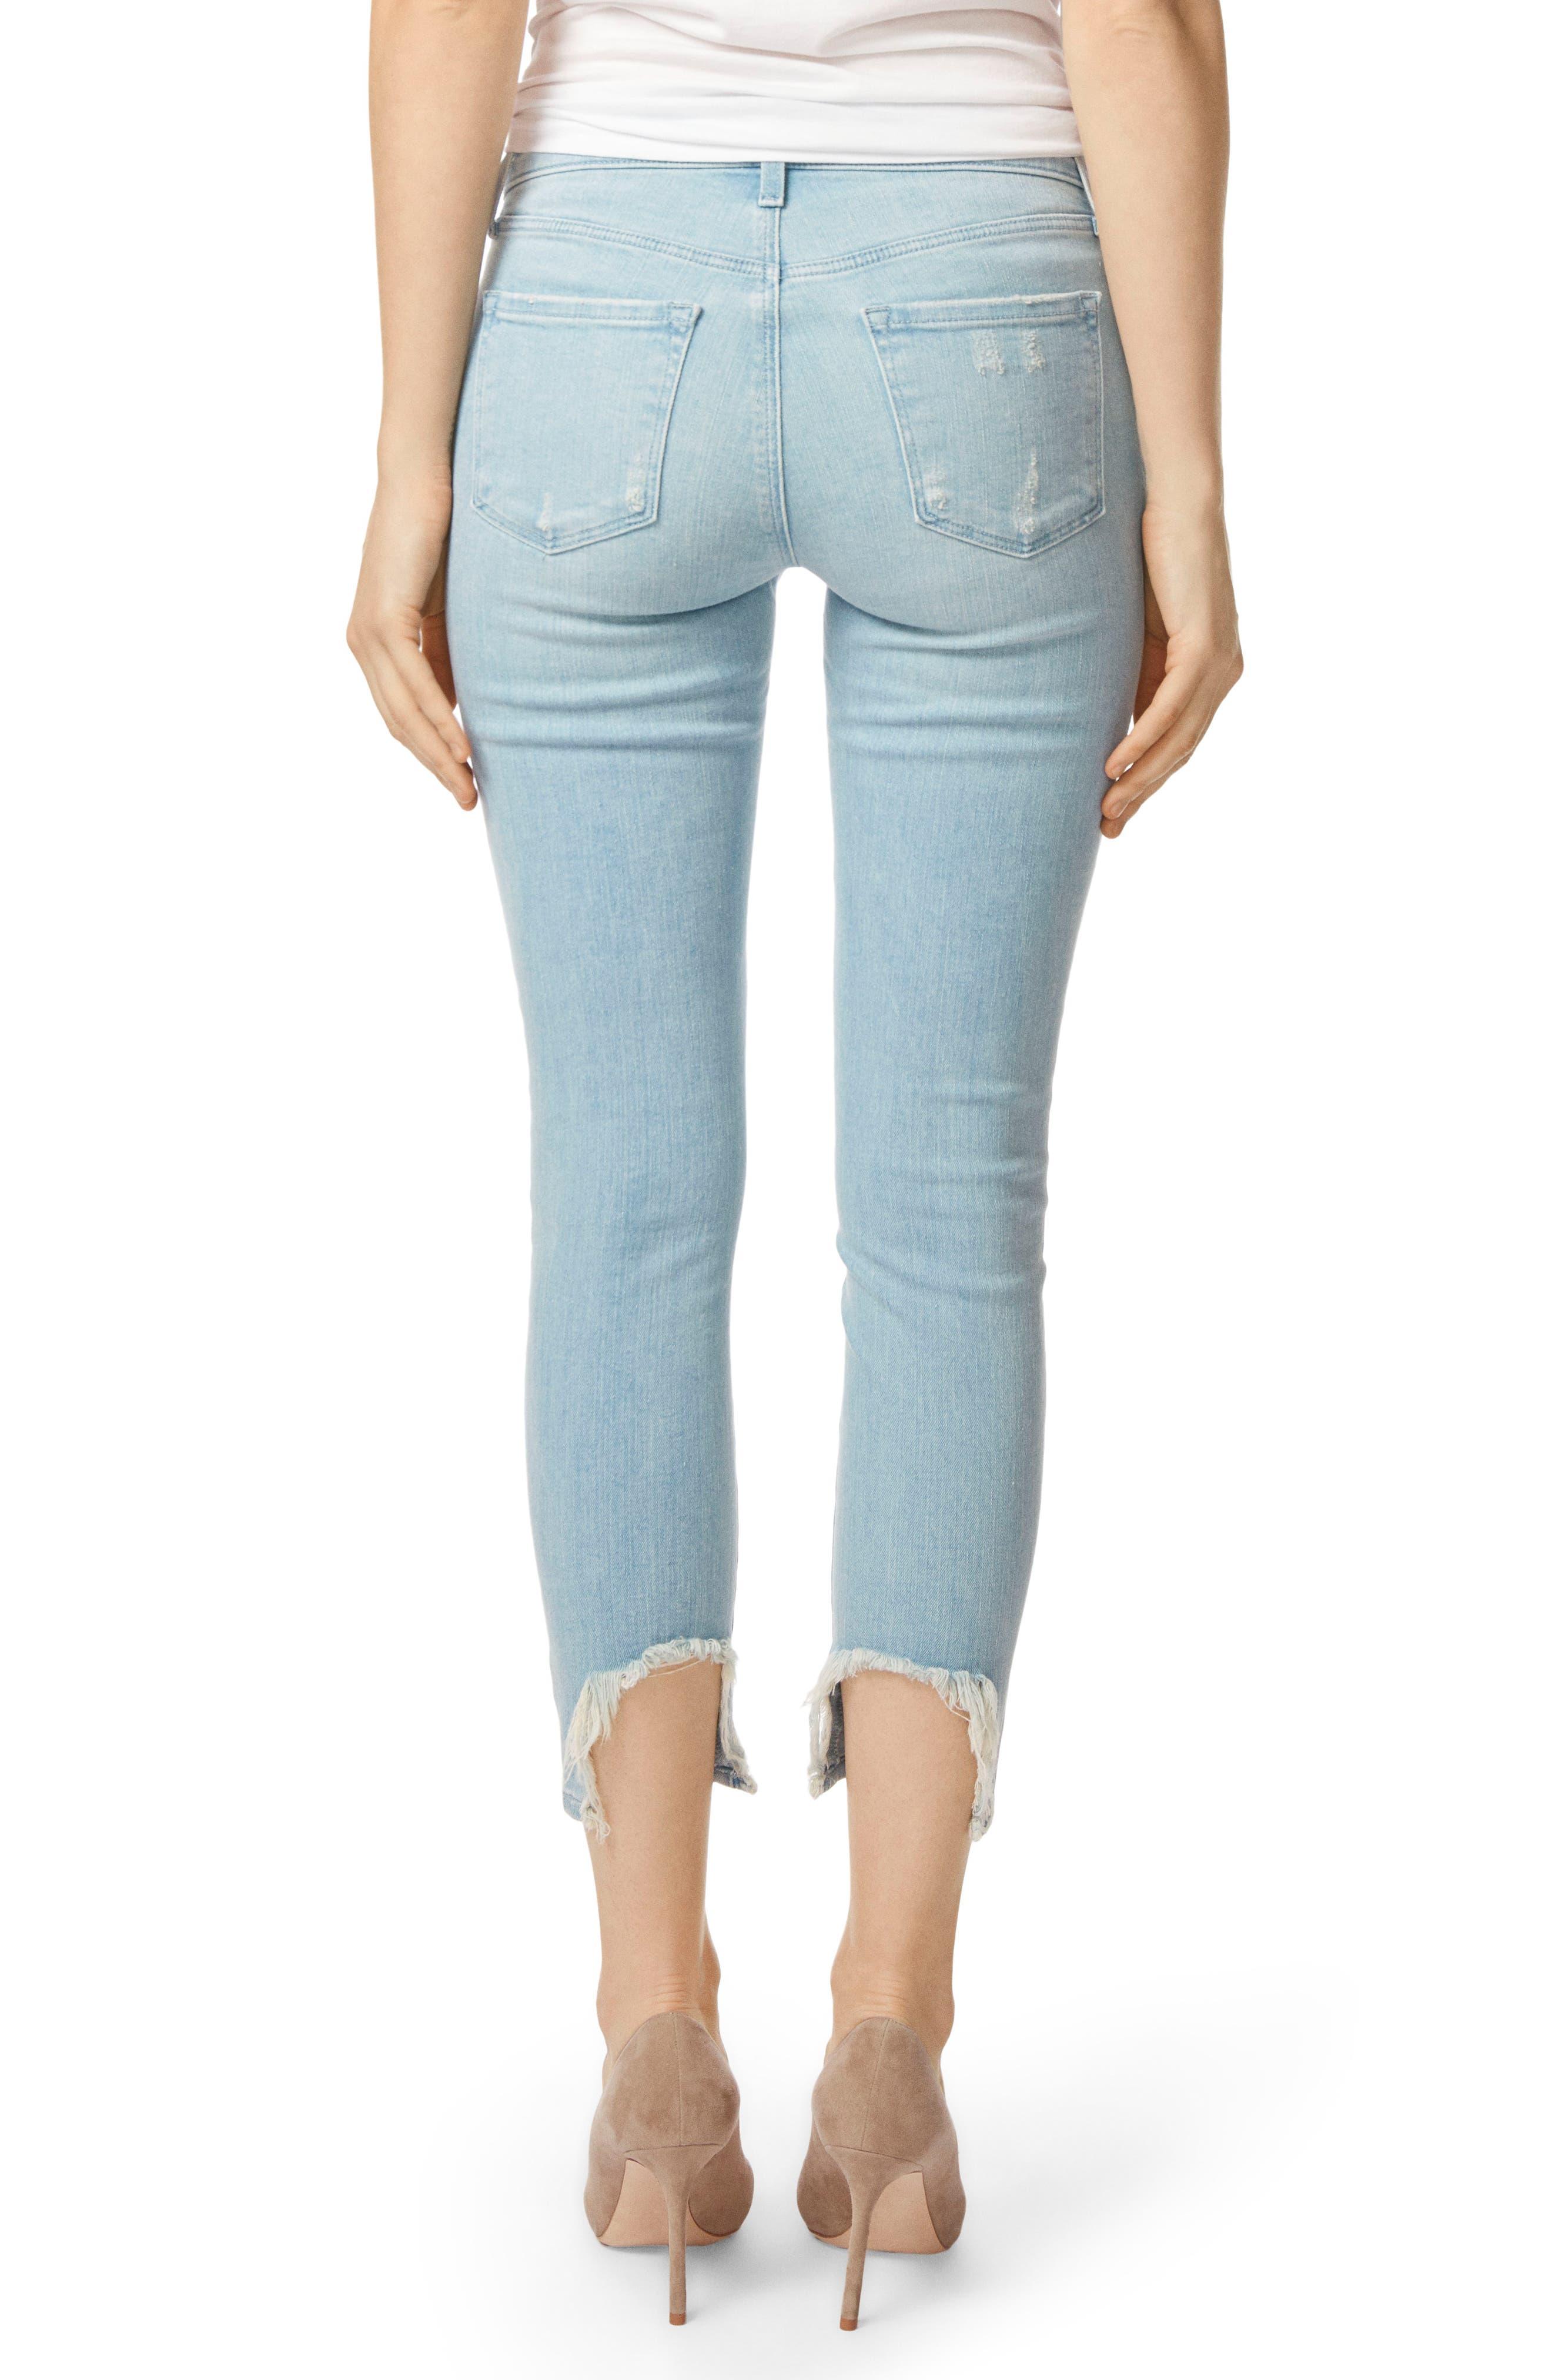 835 Capri Skinny Jeans,                             Alternate thumbnail 2, color,                             454